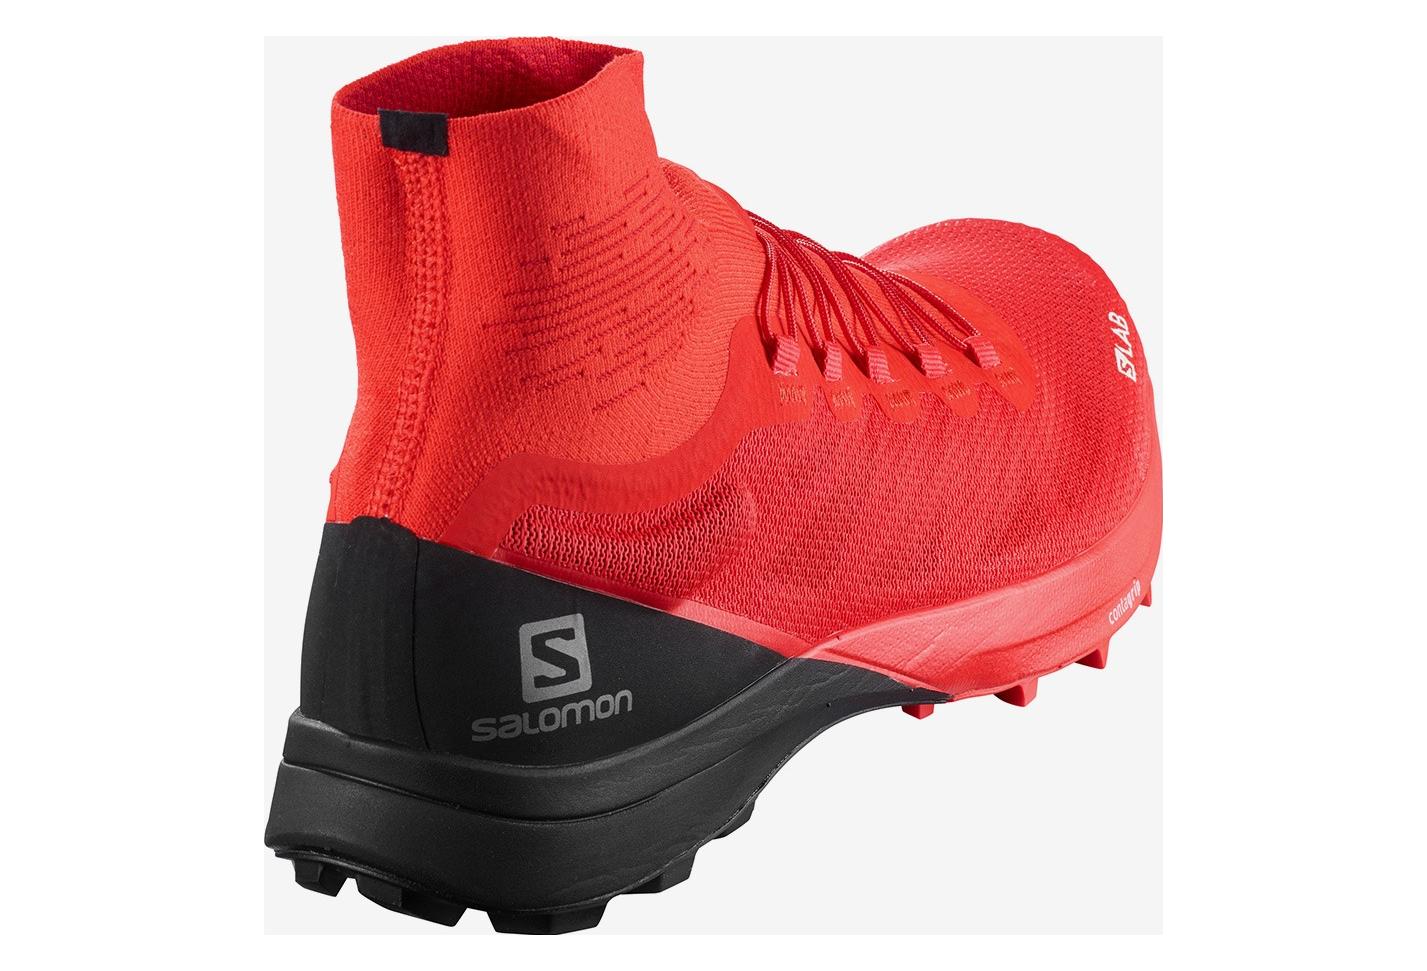 Salomon S/LAB Sense 8 SG Red Black